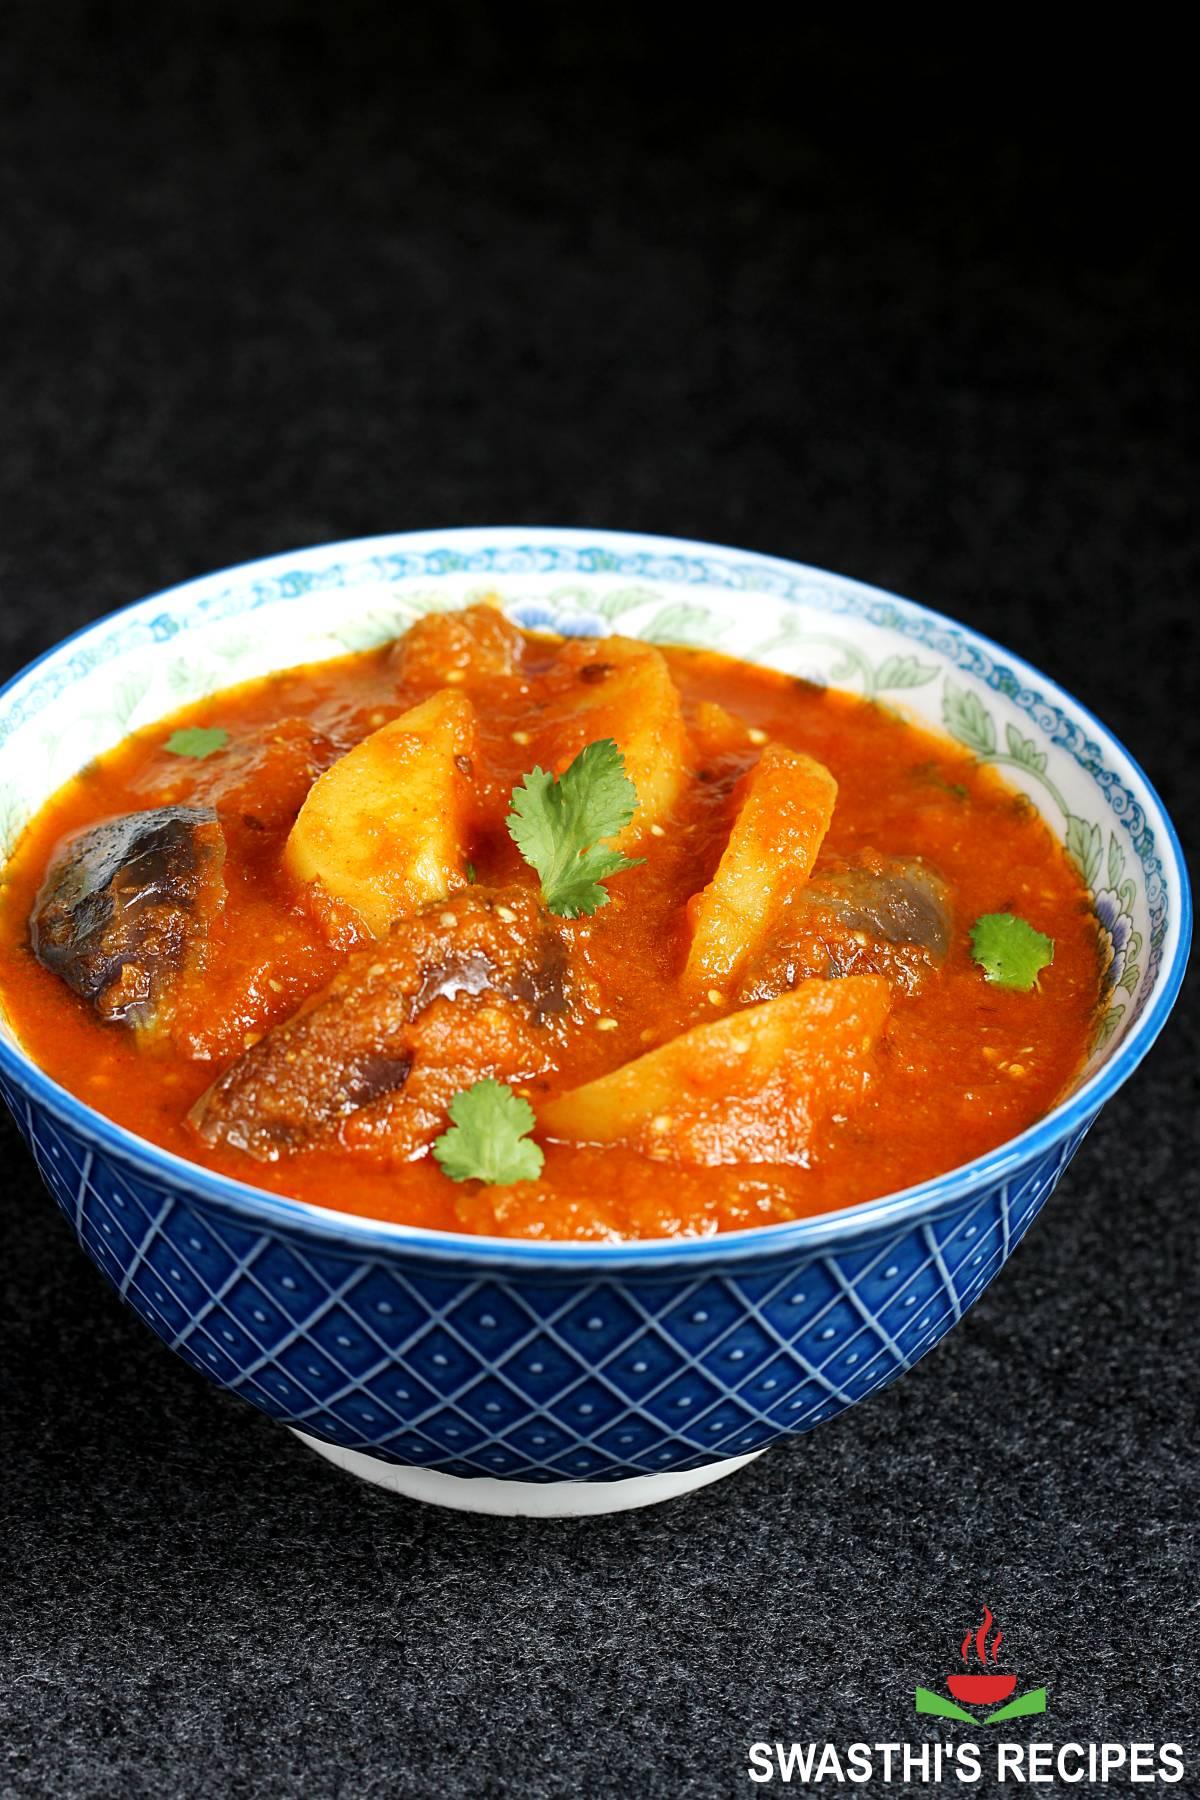 aloo baingan gravy served in a blue bowl